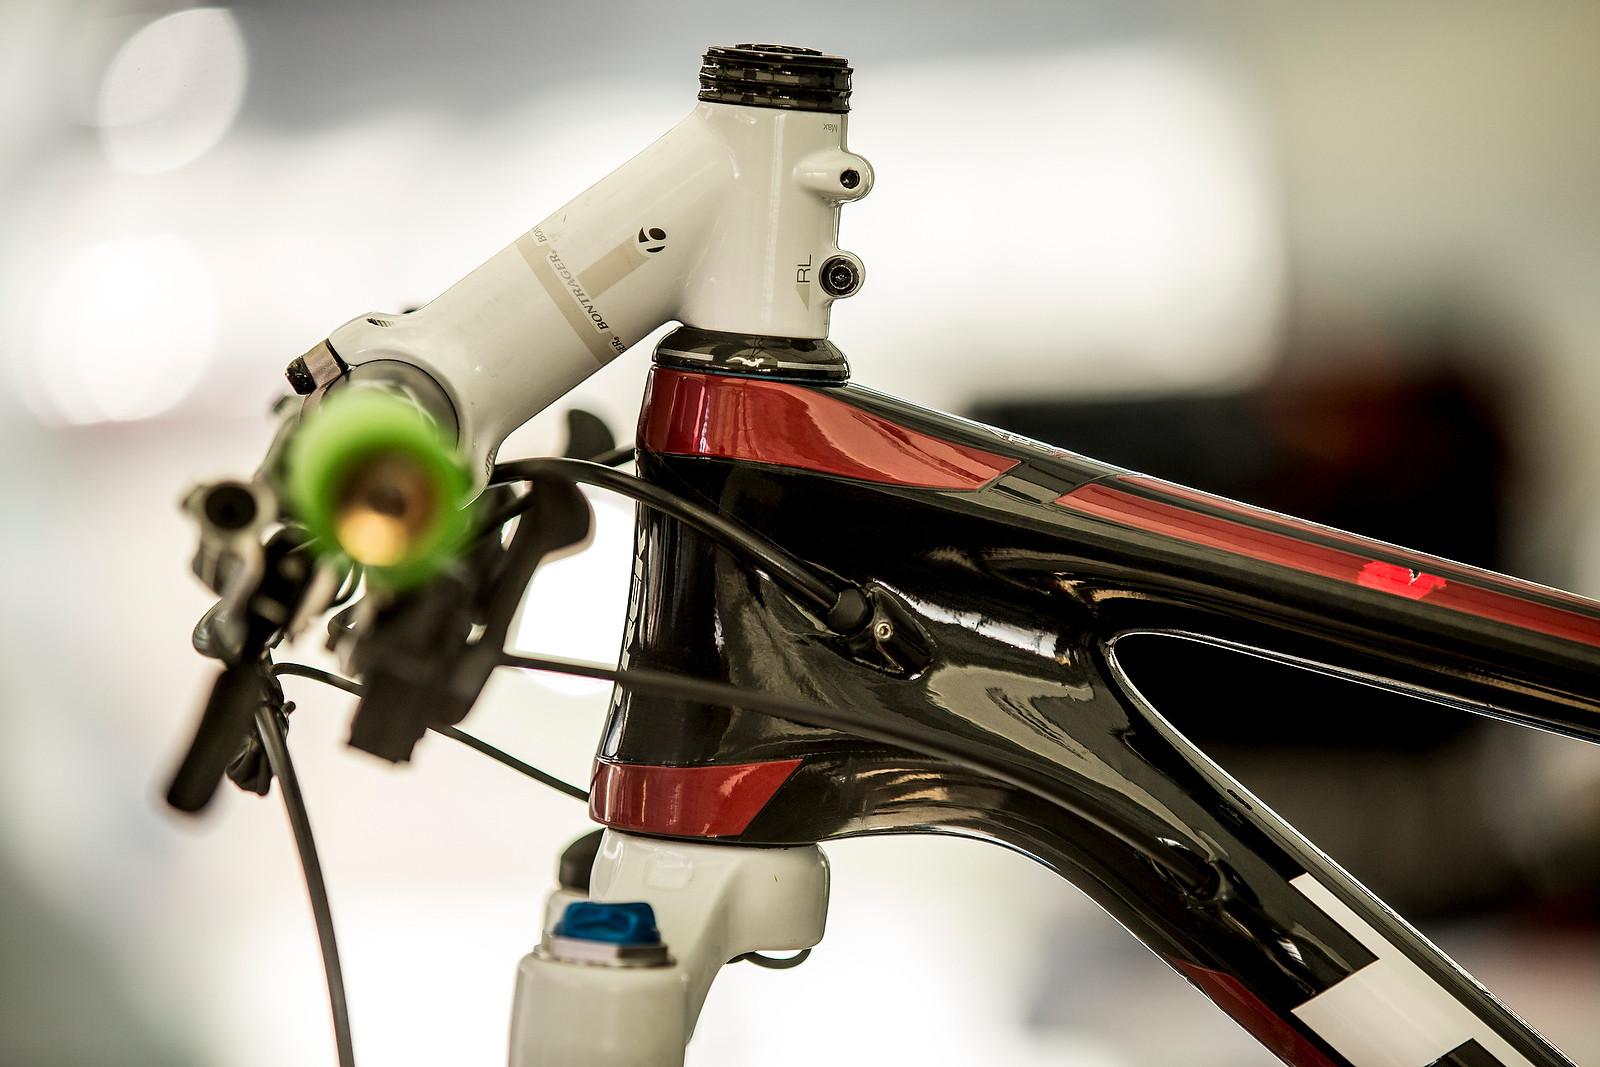 Brook MacDonald's Aero World Champs Setup Seen at Val di Sole? - Pit Bits: 2013 Val di Sole World Cup - Mountain Biking Pictures - Vital MTB